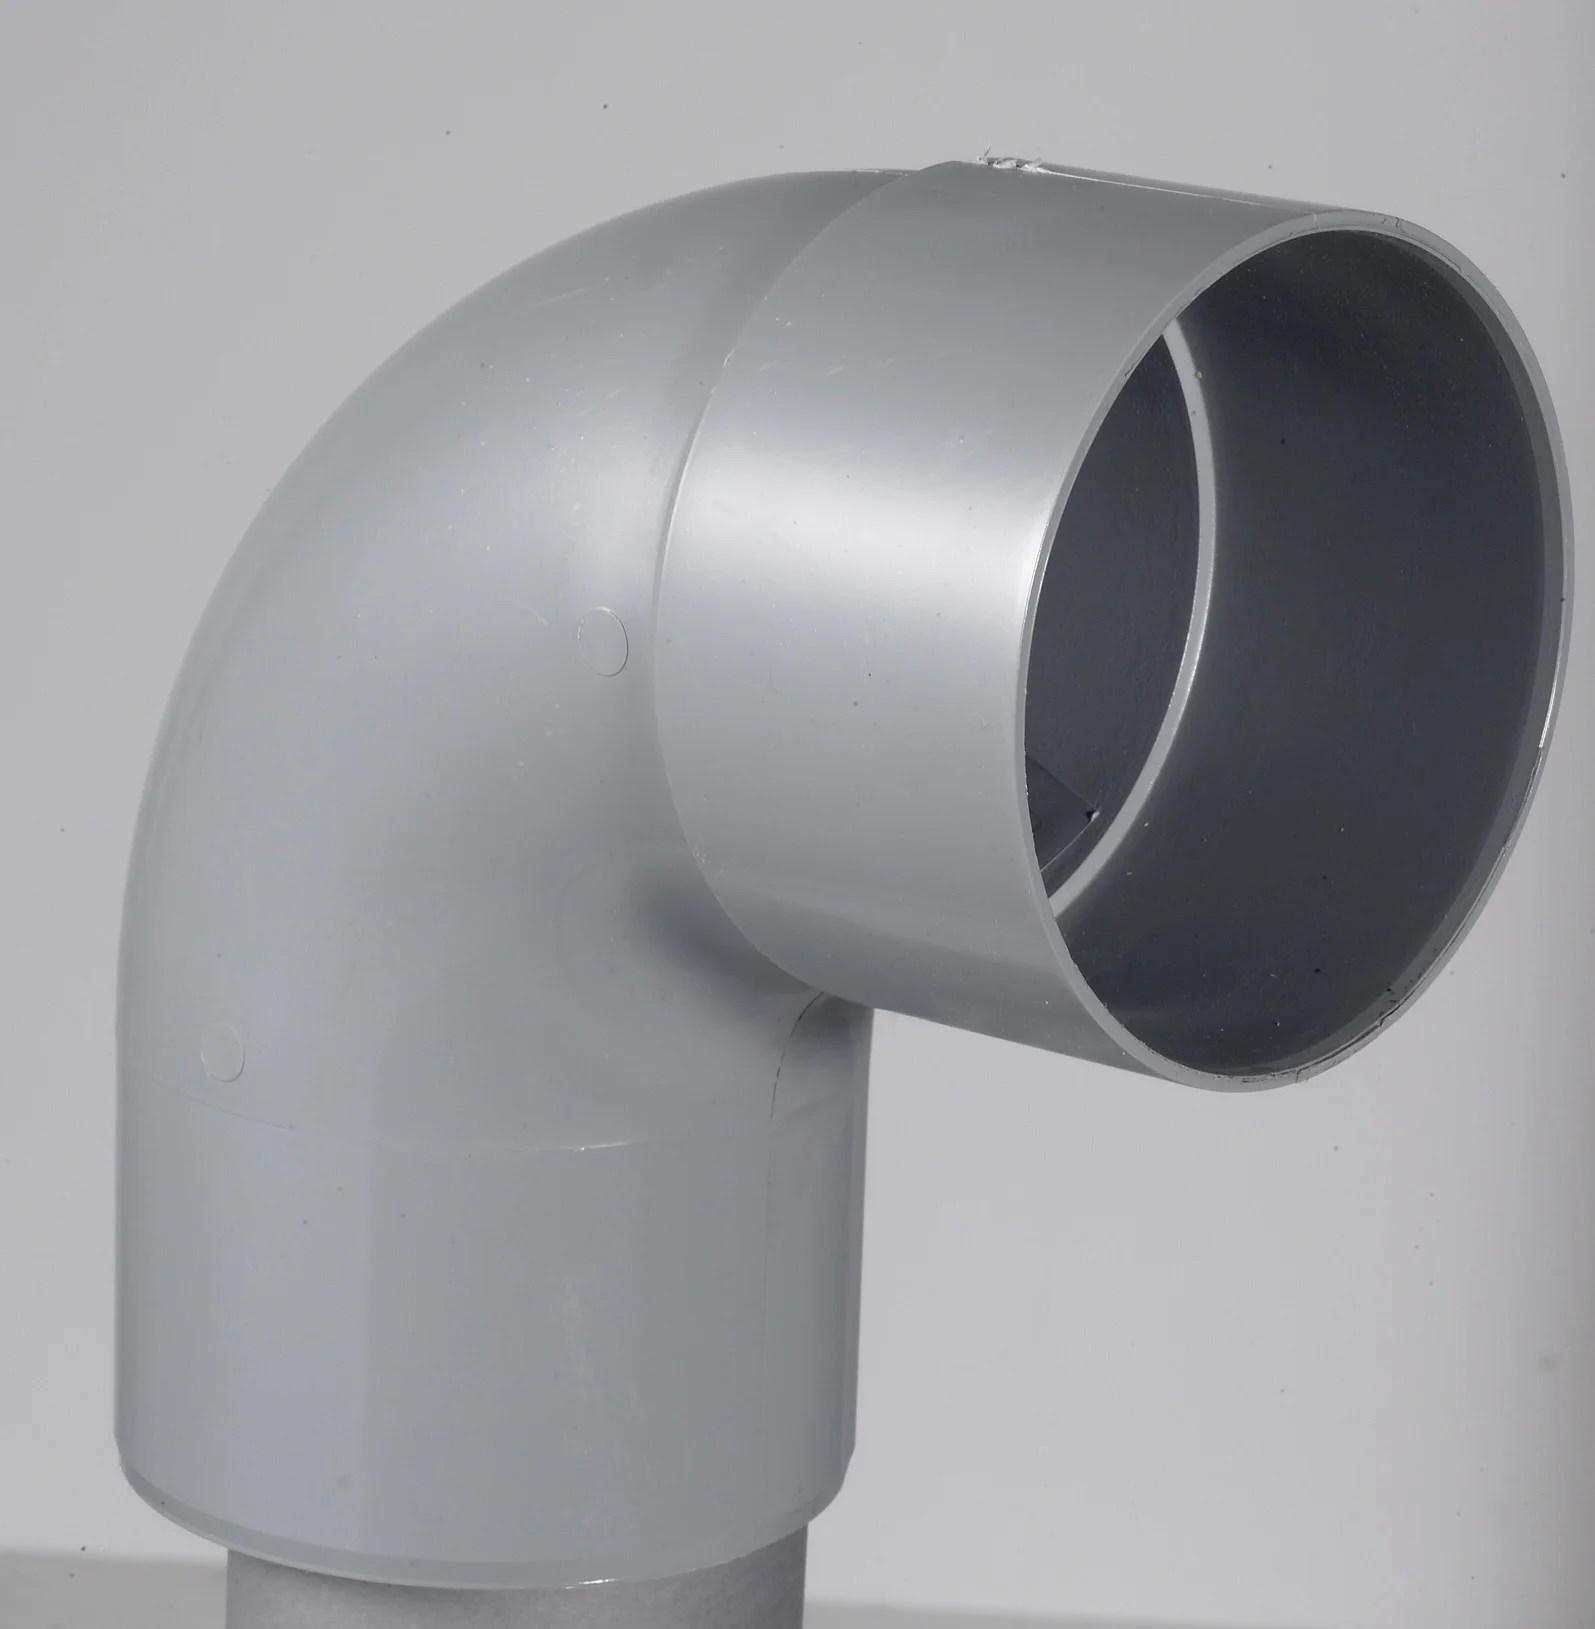 Caniveau Meagard 200 Beton Polymere L 15 Cm L 1 M Leroy Merlin